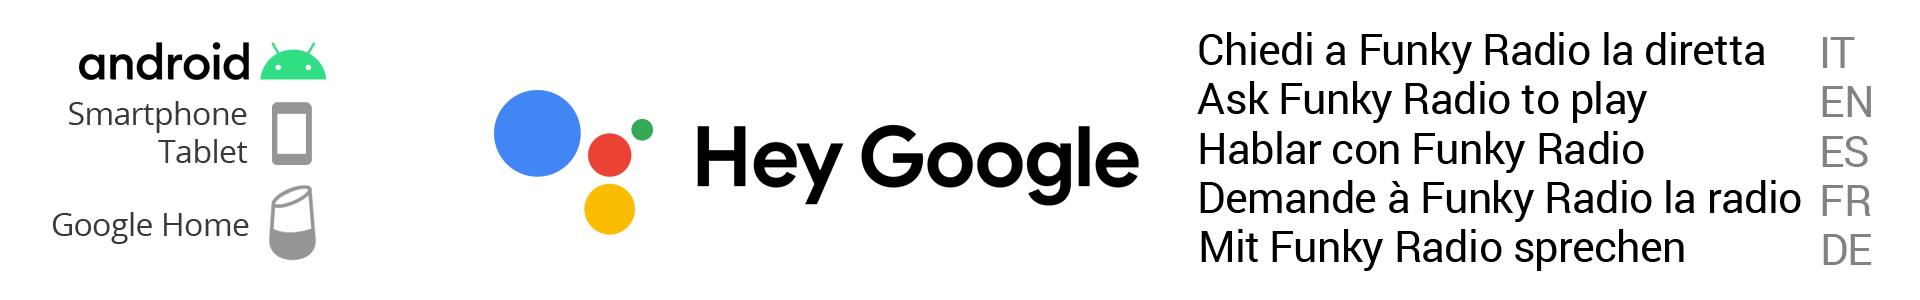 google action - funky radio